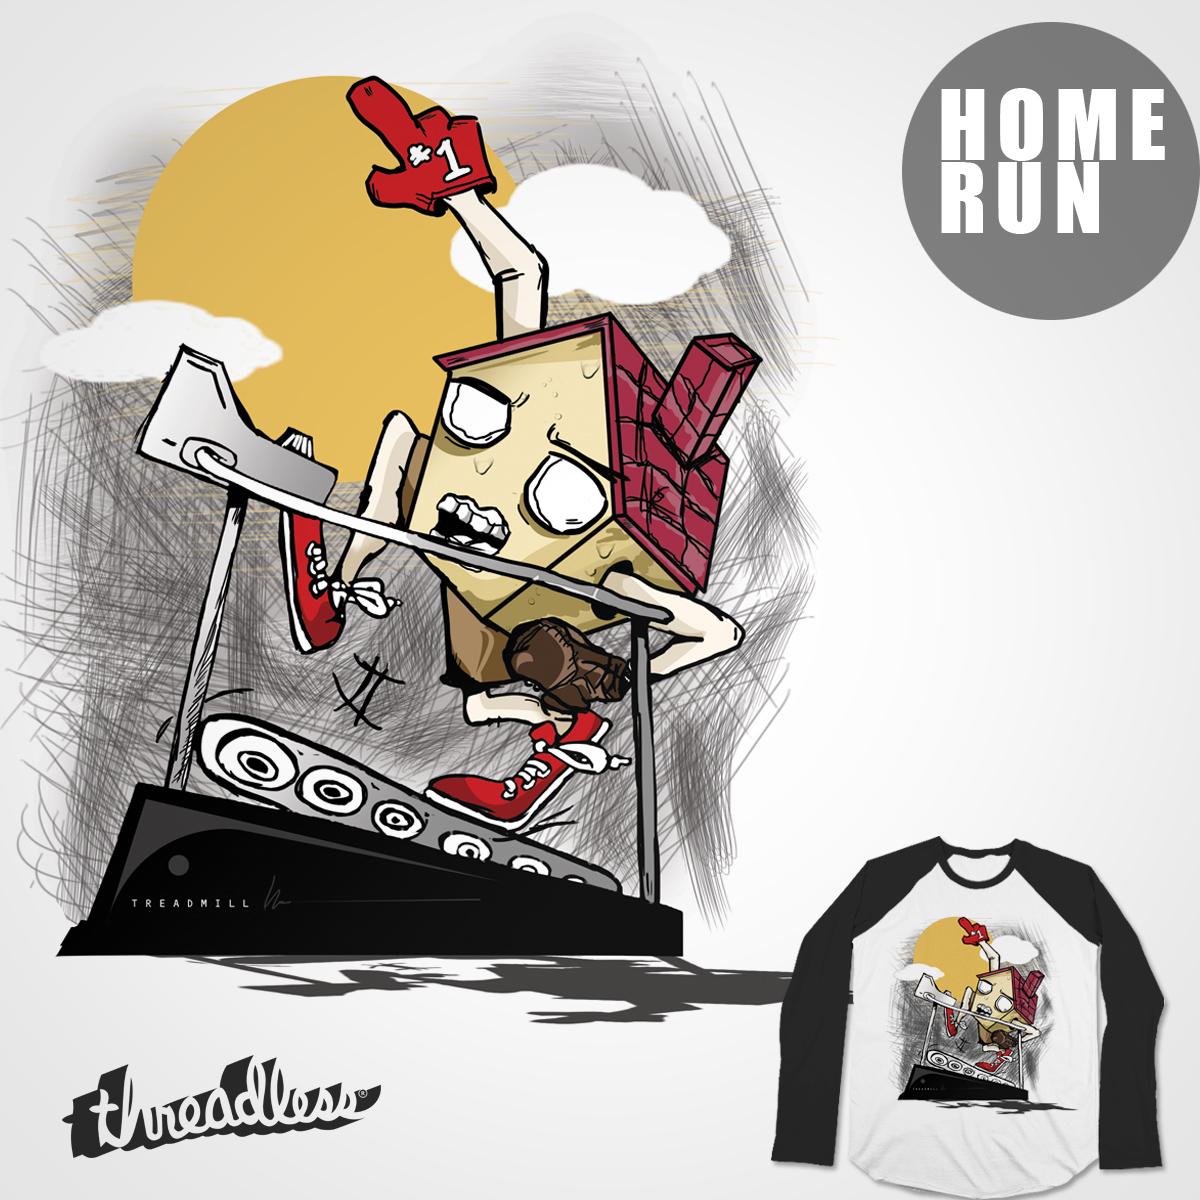 HOME RUN by fathurdavega on Threadless